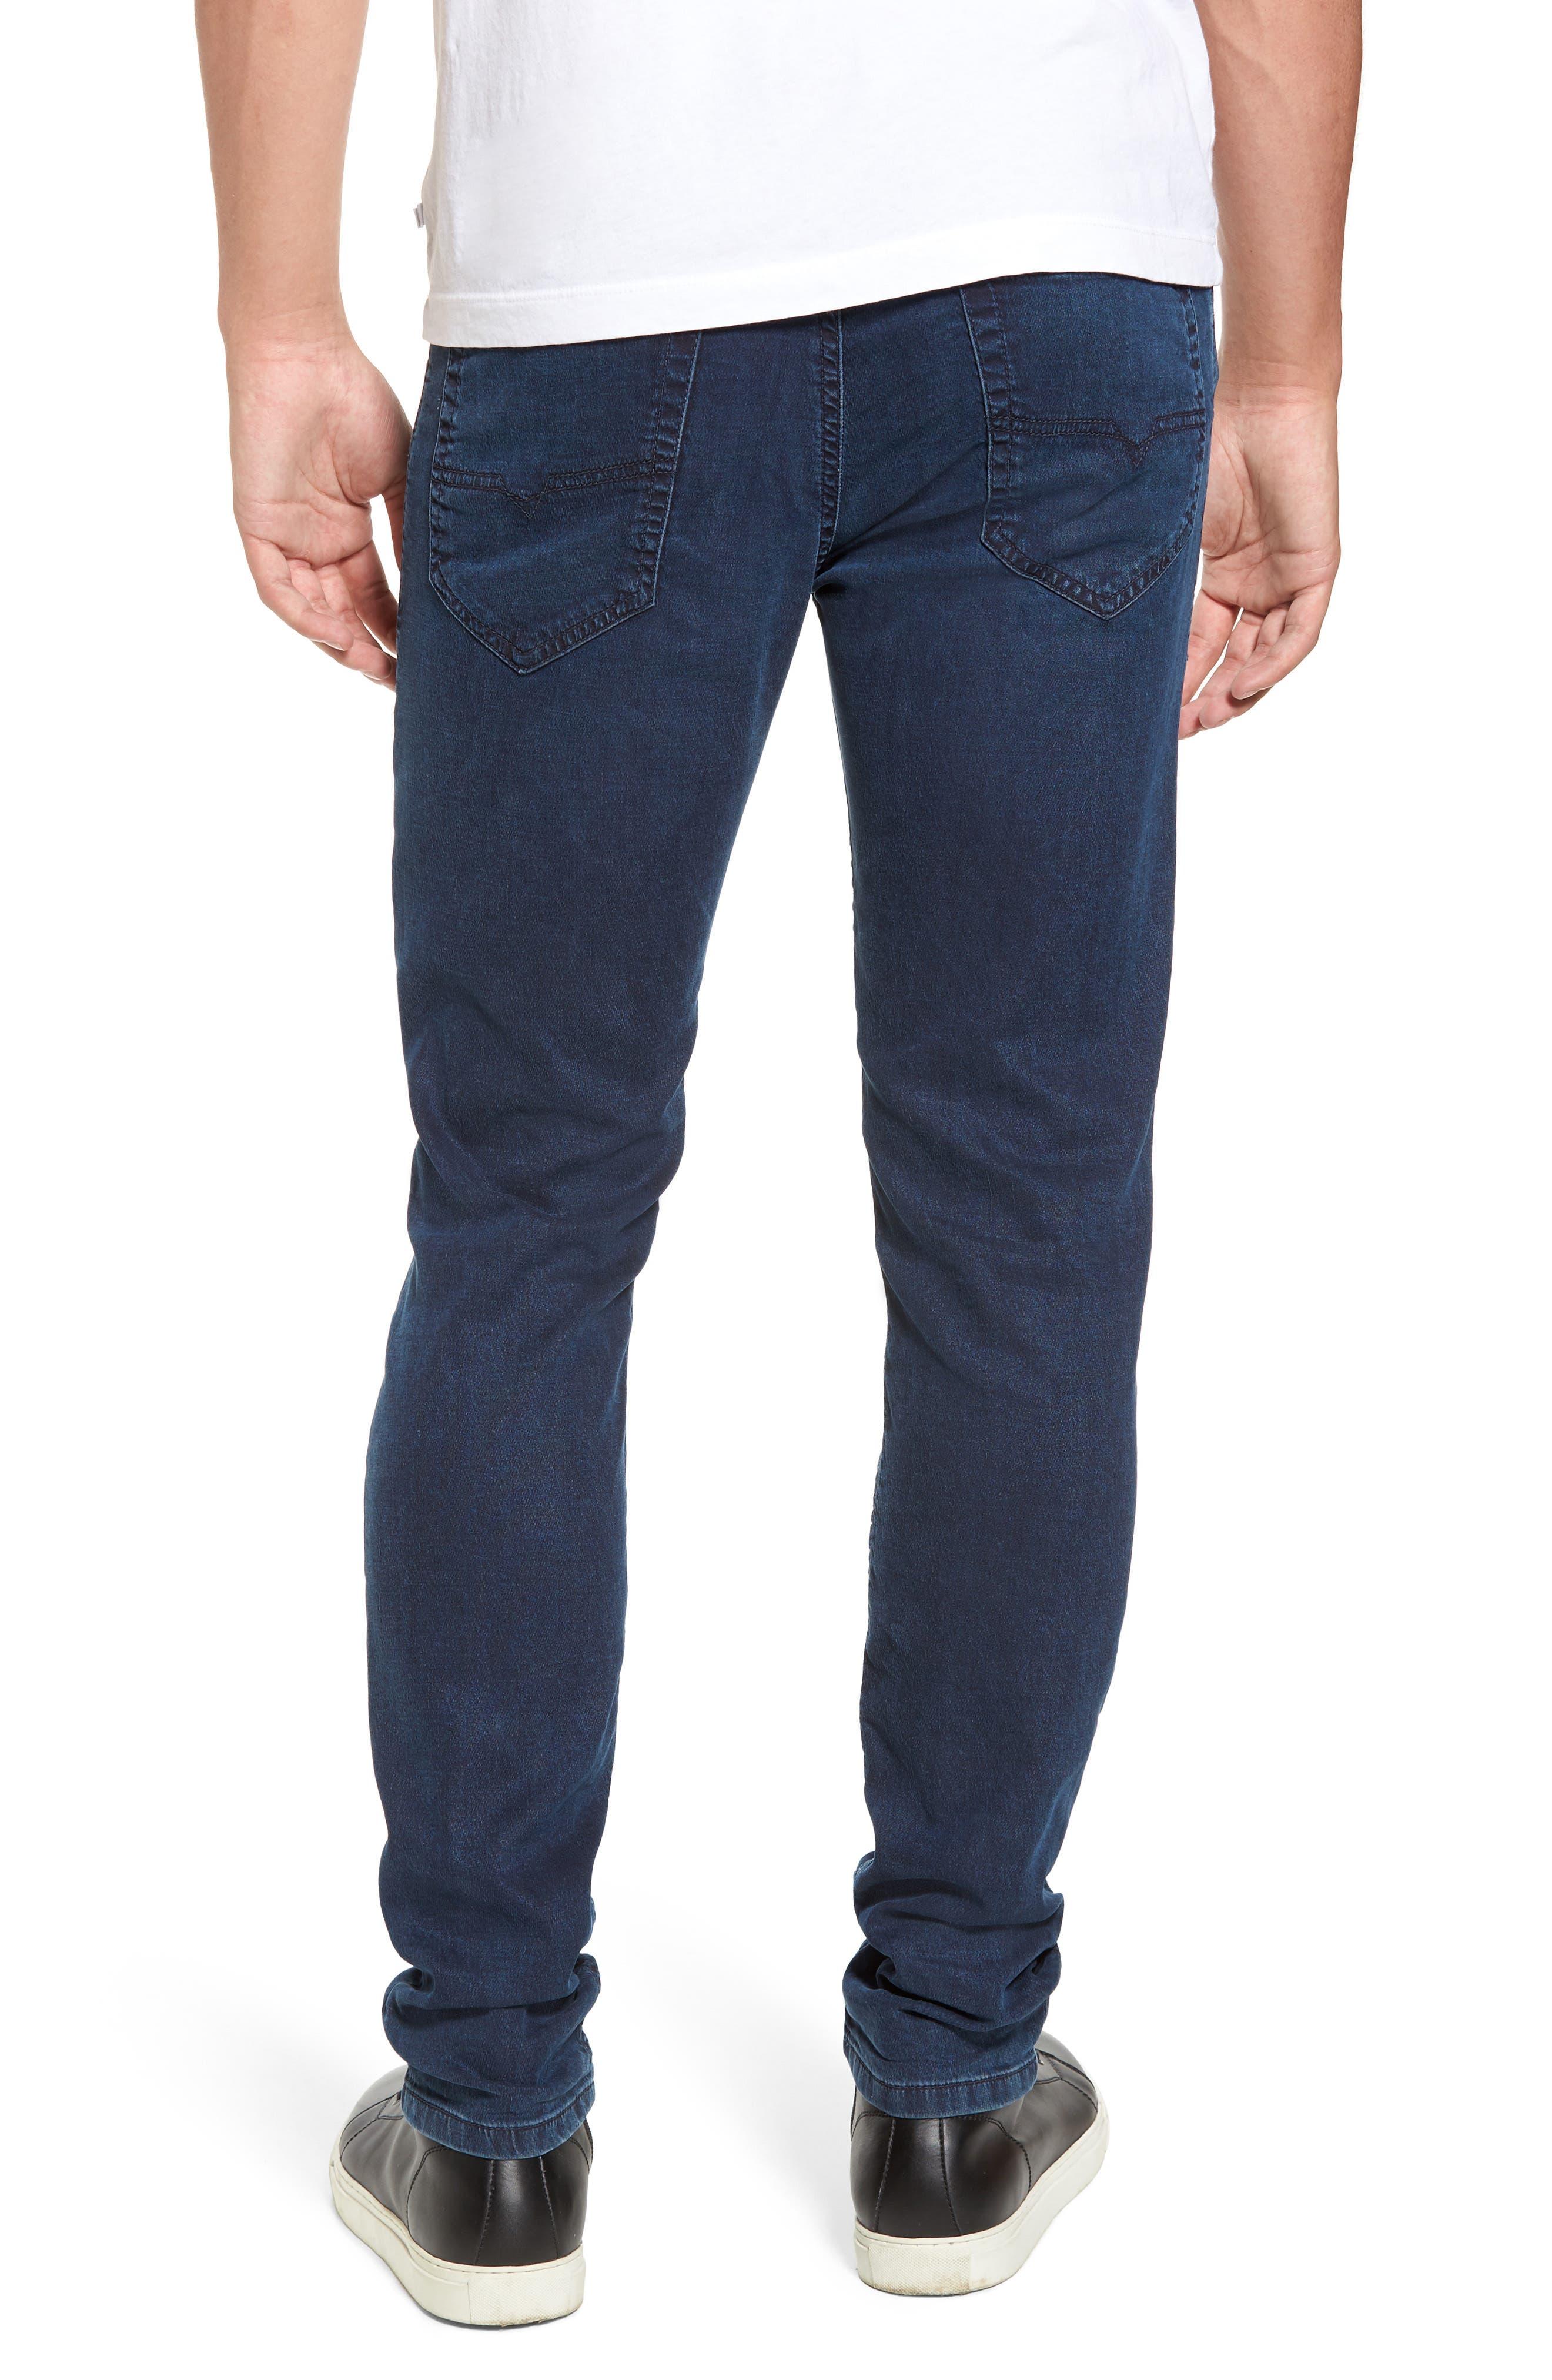 Thommer Slim Fit Jeans,                             Alternate thumbnail 2, color,                             0688J